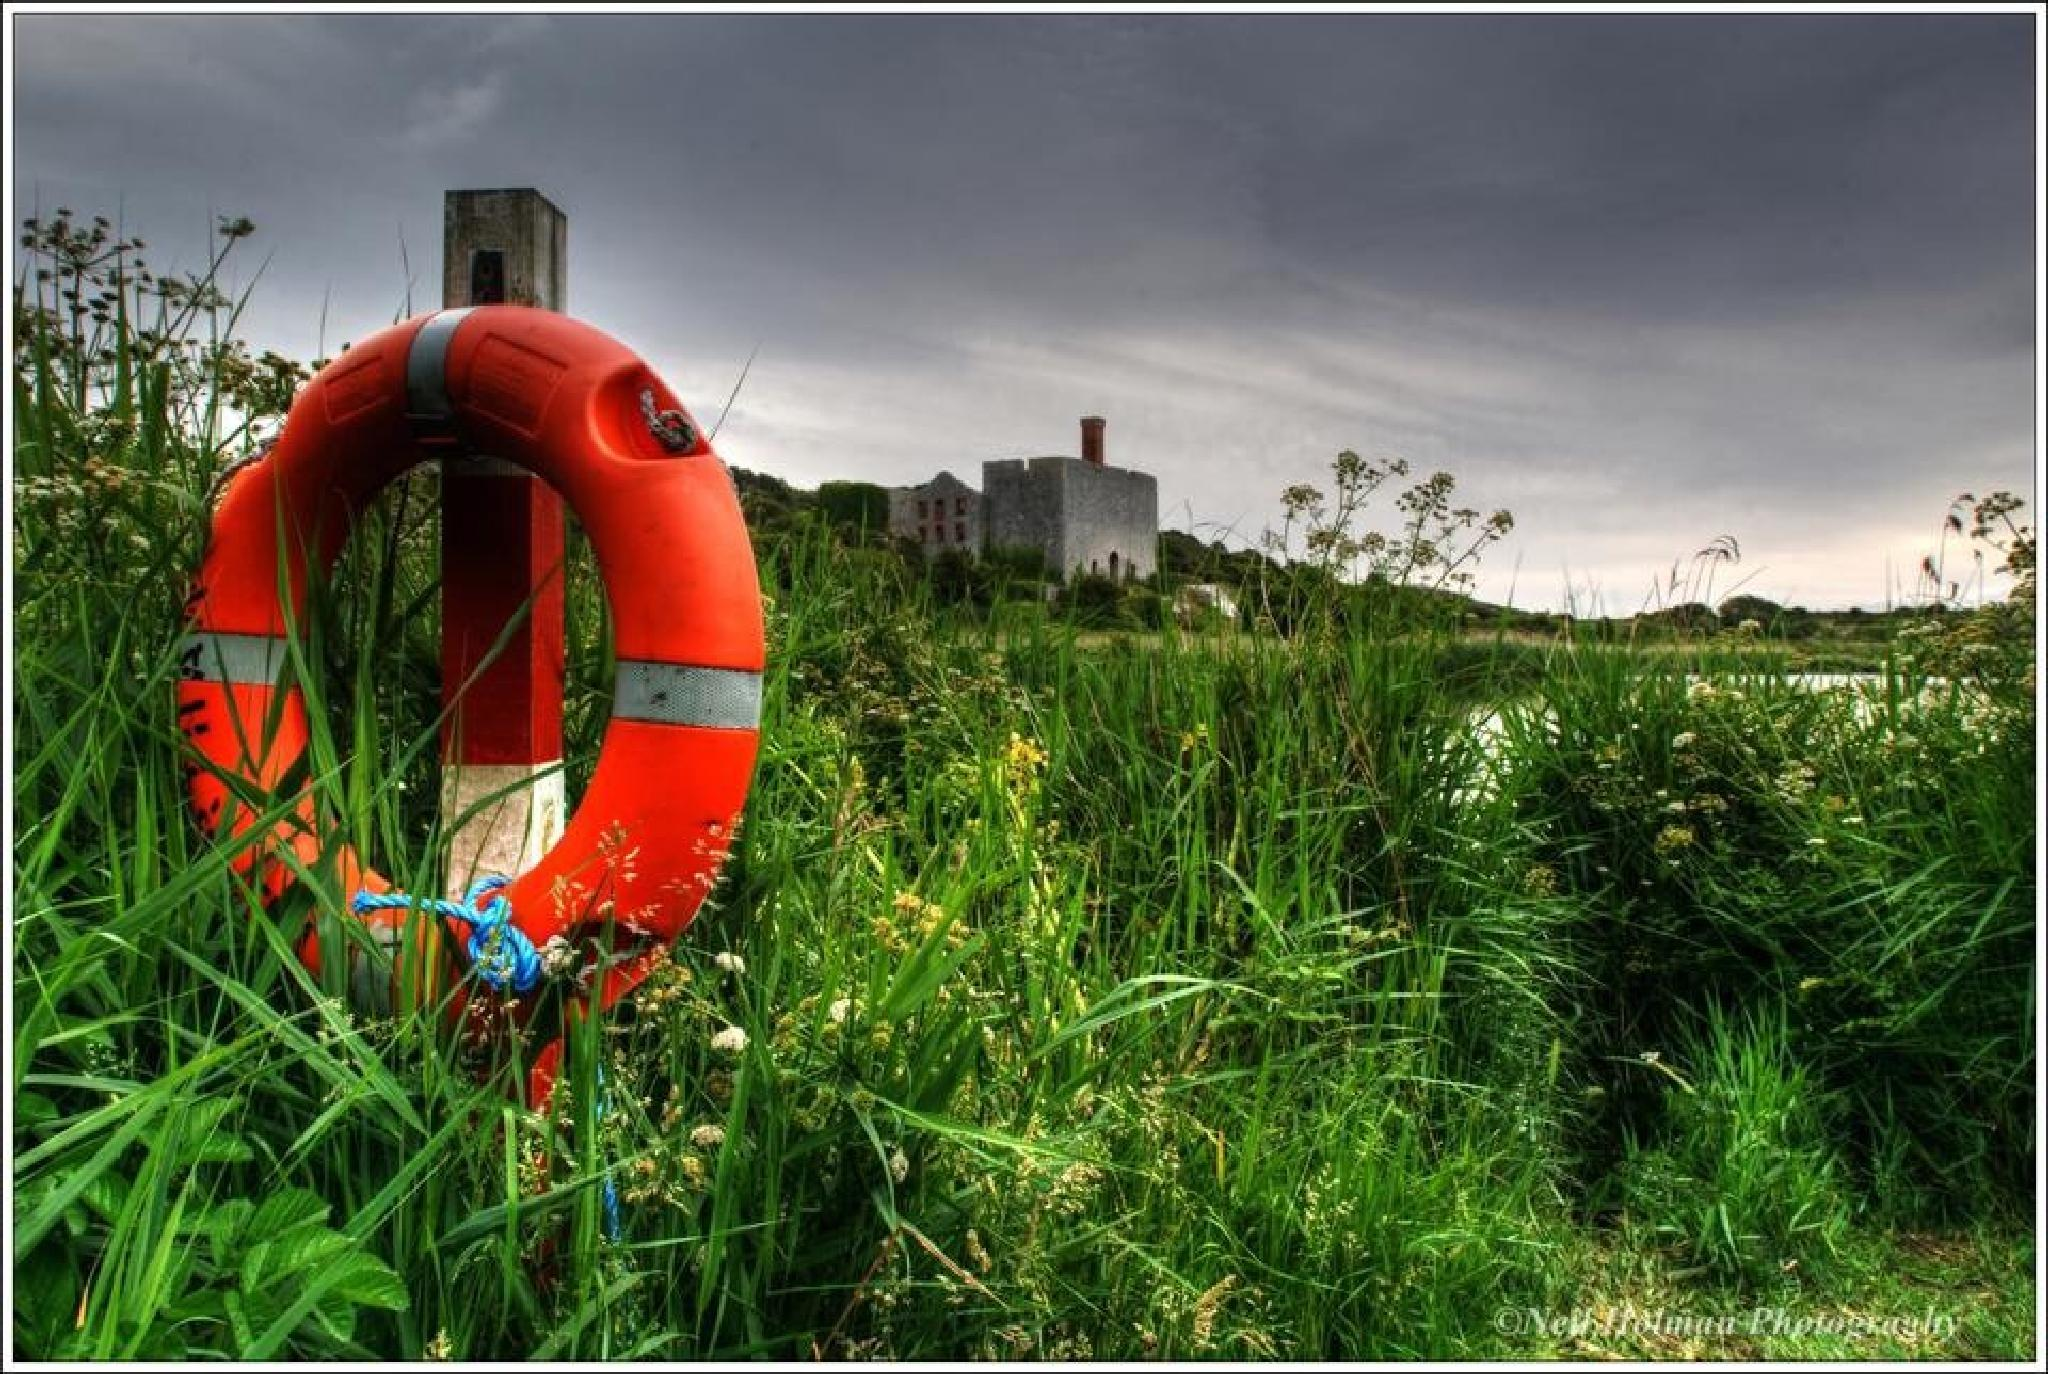 Lifebuoy, Lime Works Aberthaw by Neil Holman